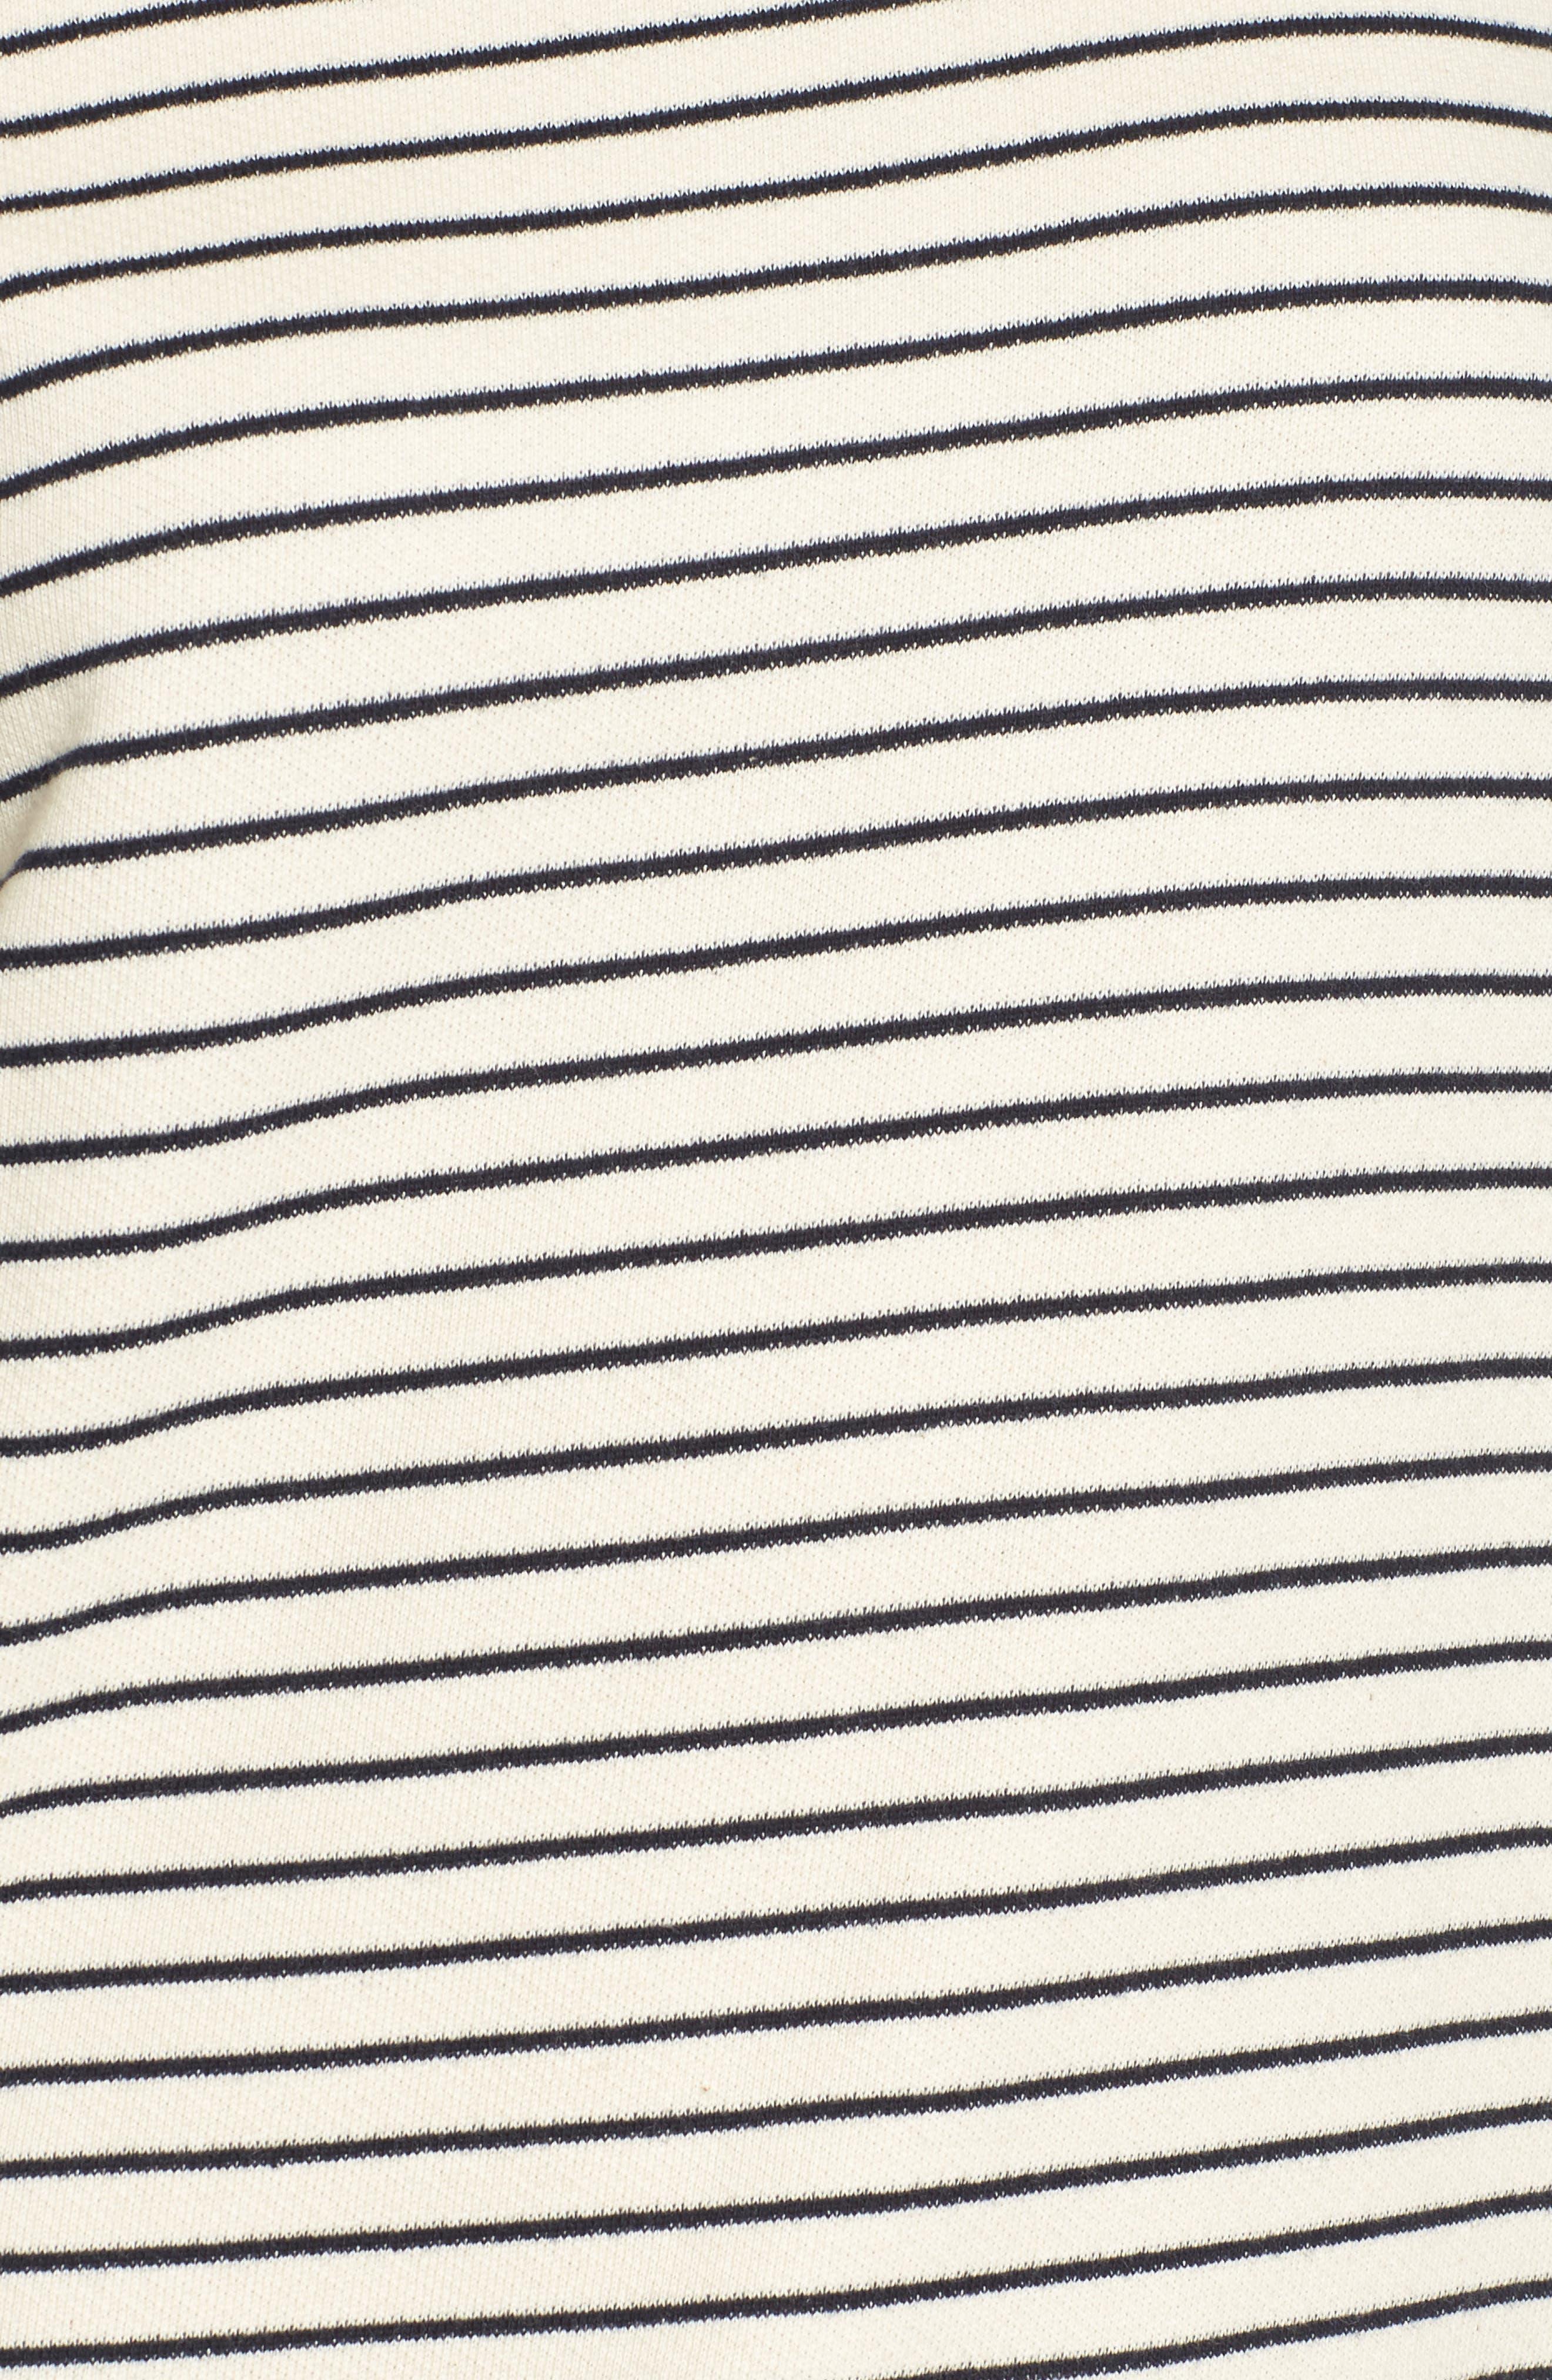 Wildair Cold Shoulder Sweatshirt,                             Alternate thumbnail 5, color,                             Ski Stripe